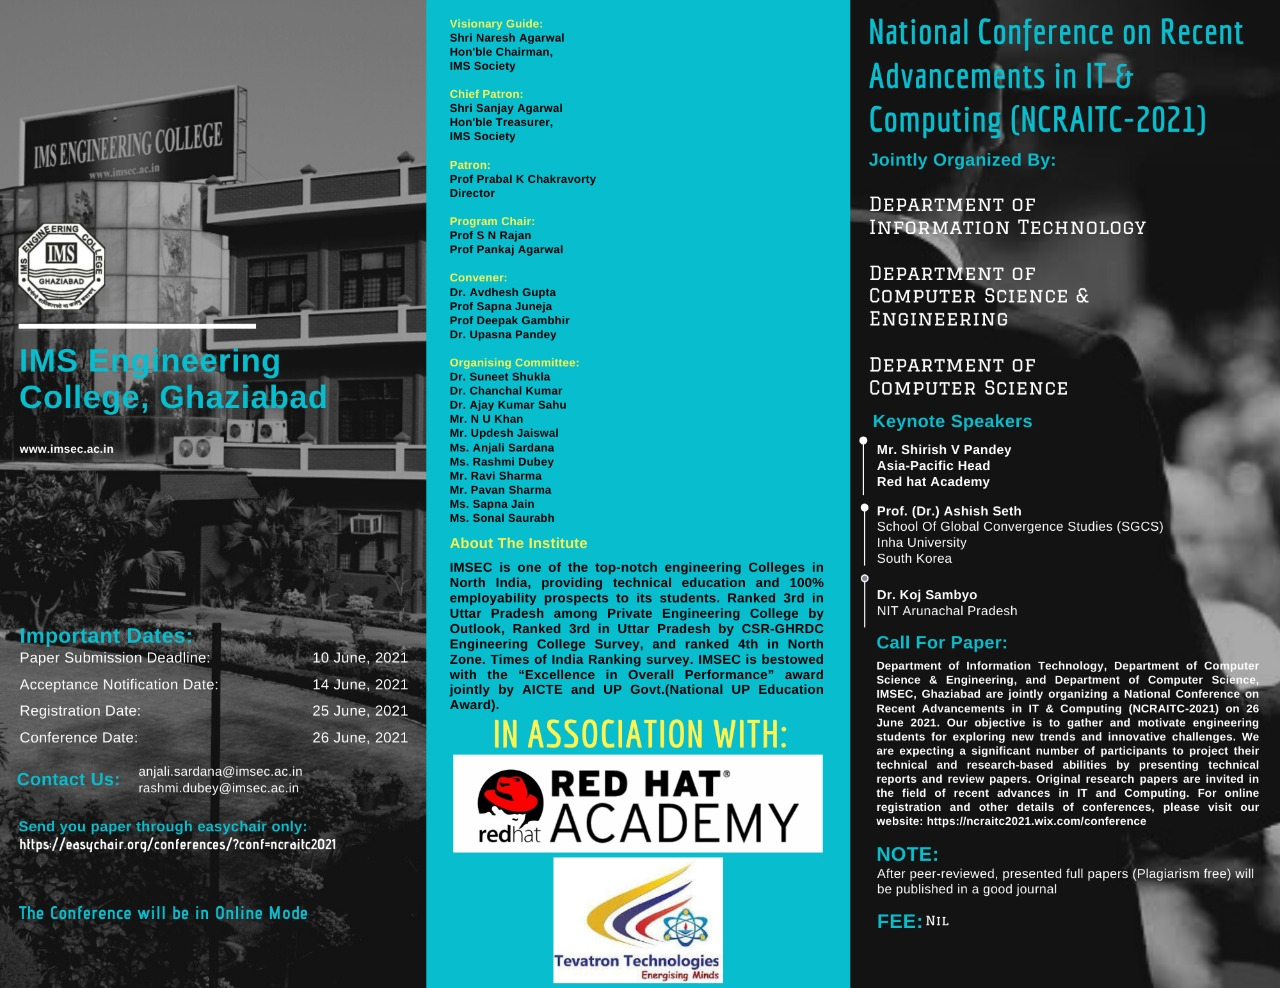 National-Conference-NCRAITC-2021-Leaflet